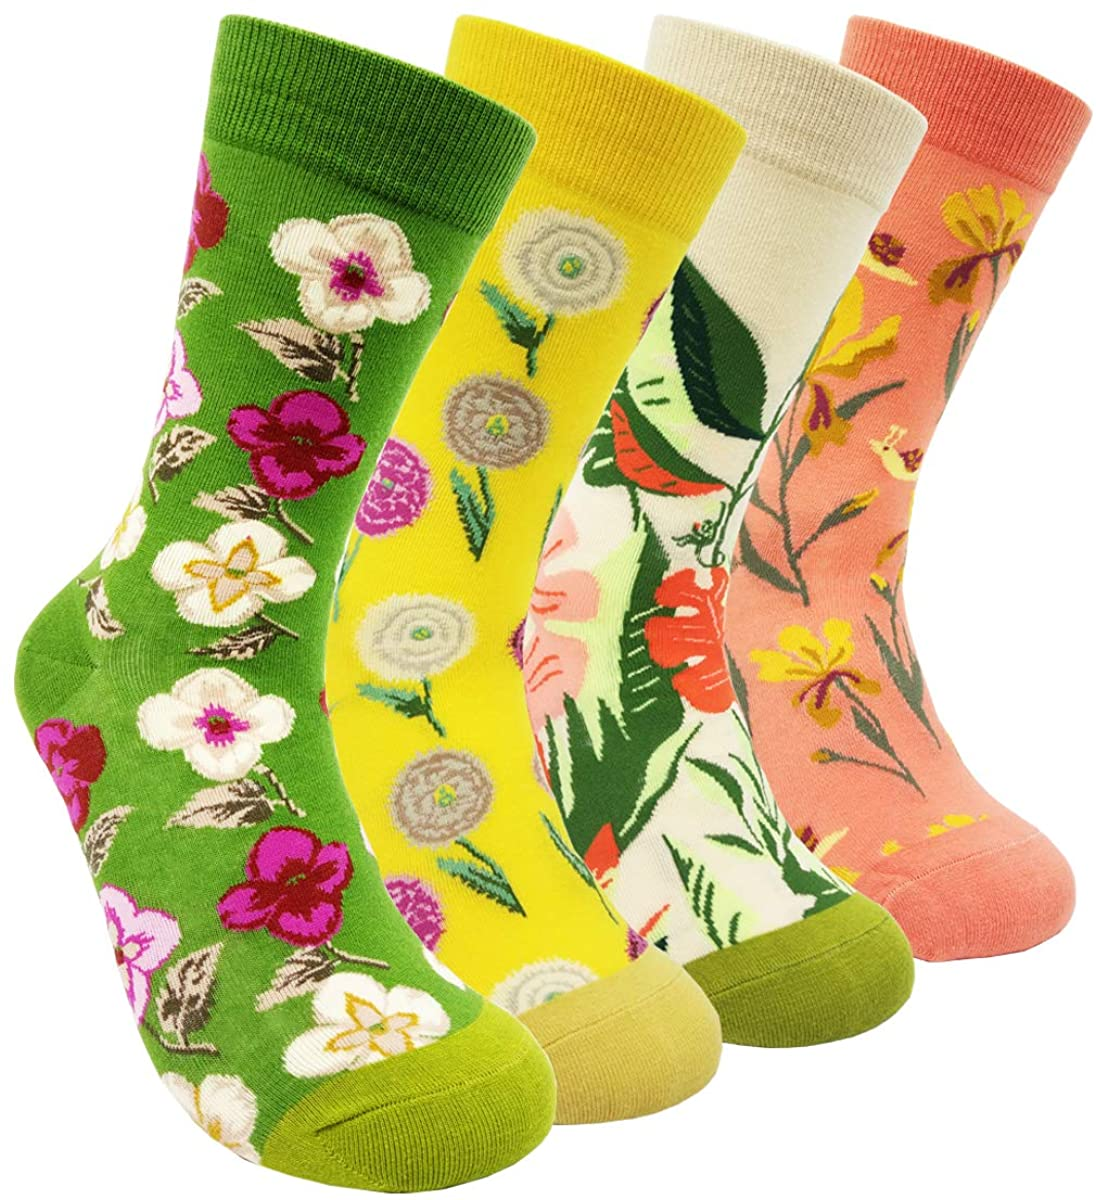 Womens Colorful Dress Crew Socks - HSELL Flower Van Gogh Funky Patterned Casual Cotton Socks